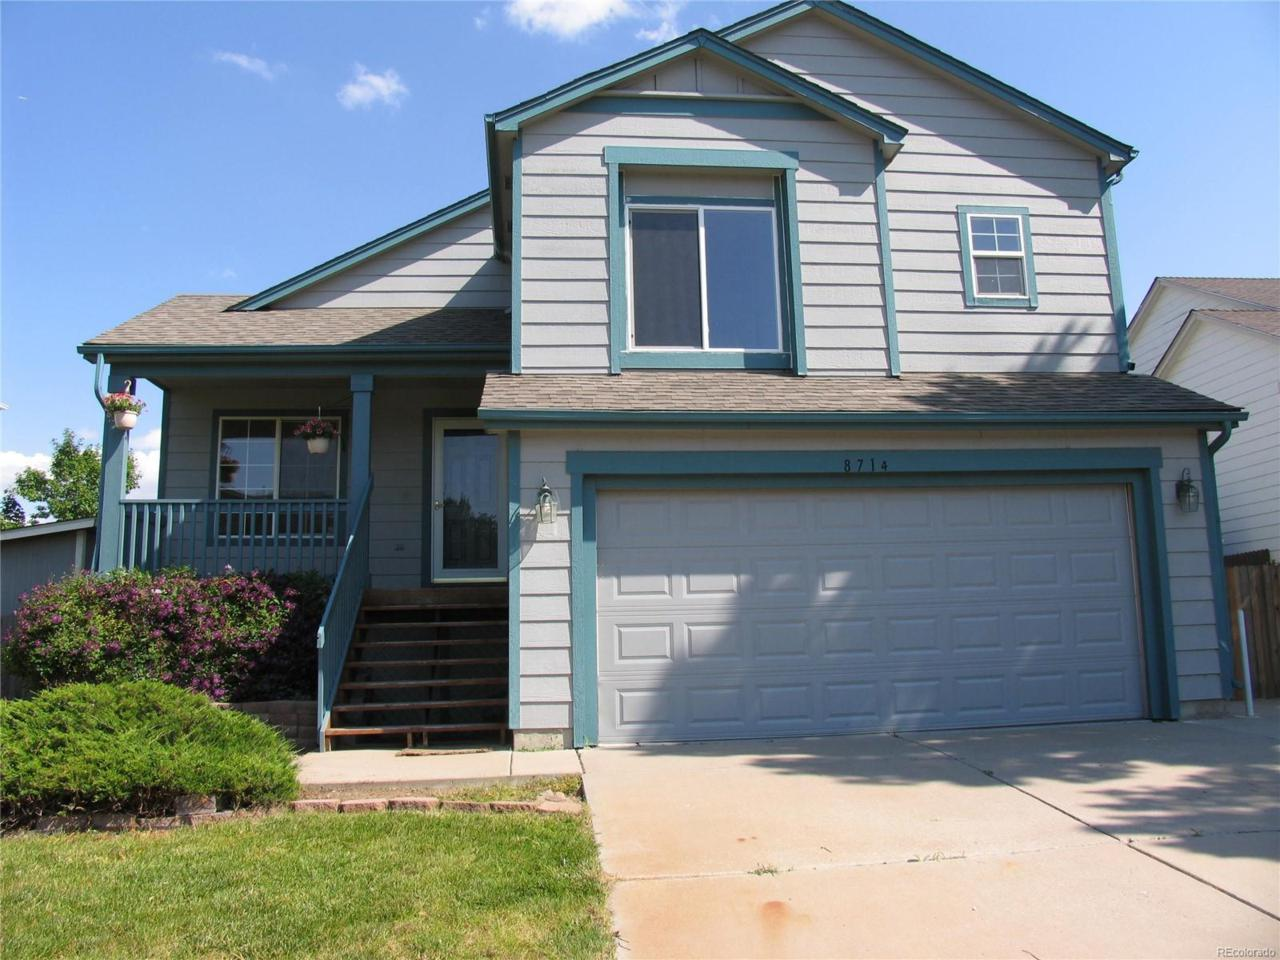 8714 Wildrye Circle, Parker, CO 80134 (MLS #8367569) :: 8z Real Estate